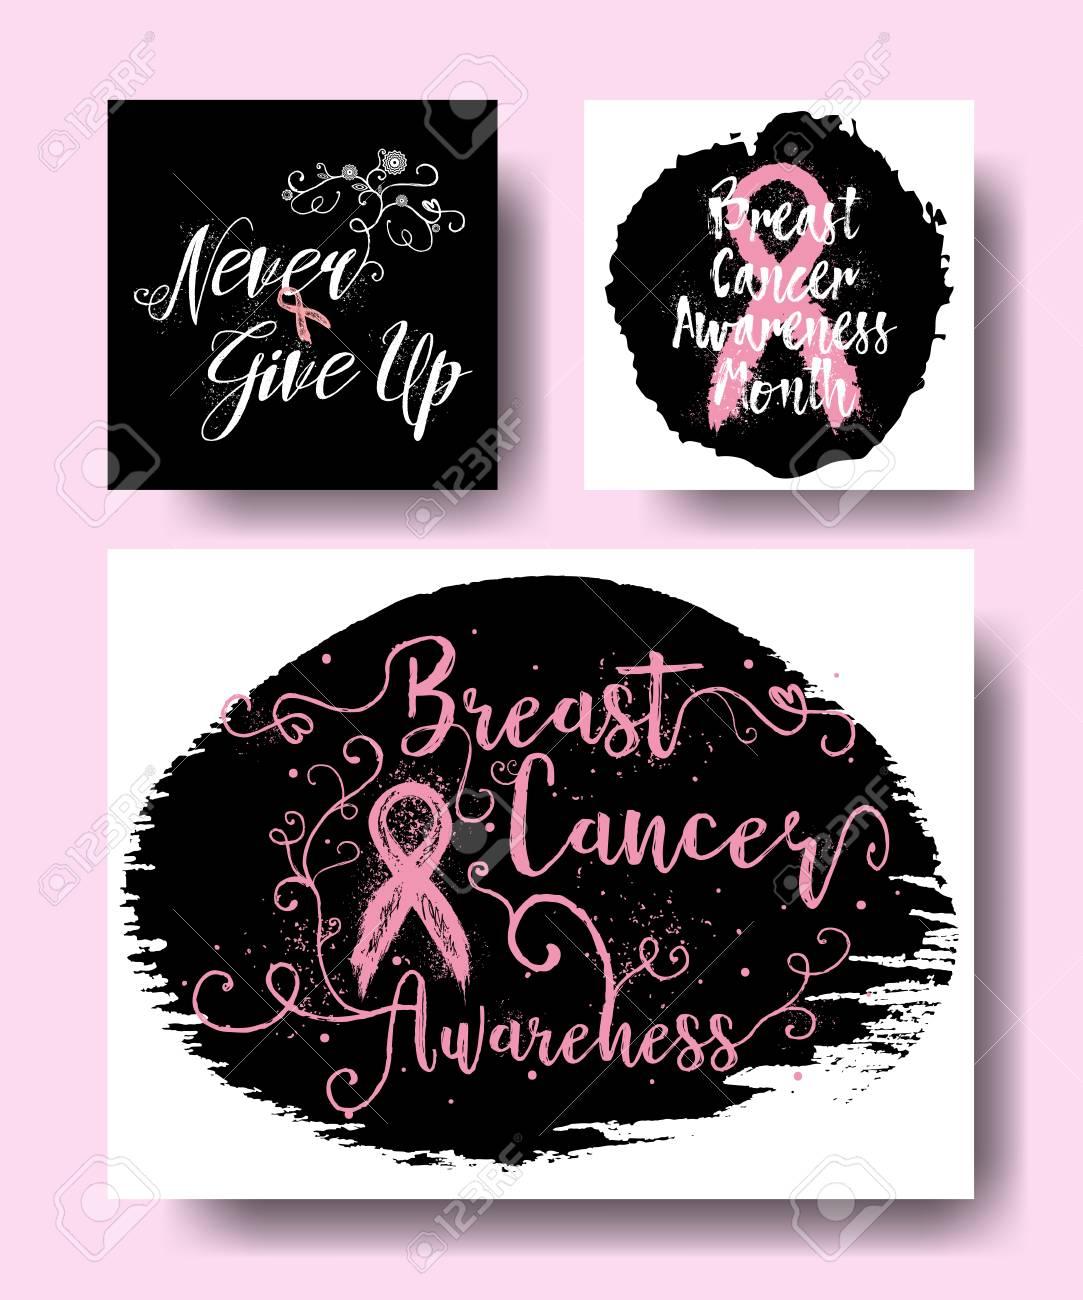 9428802b1d1 Set of Breast cancer awareness month in October cards design..